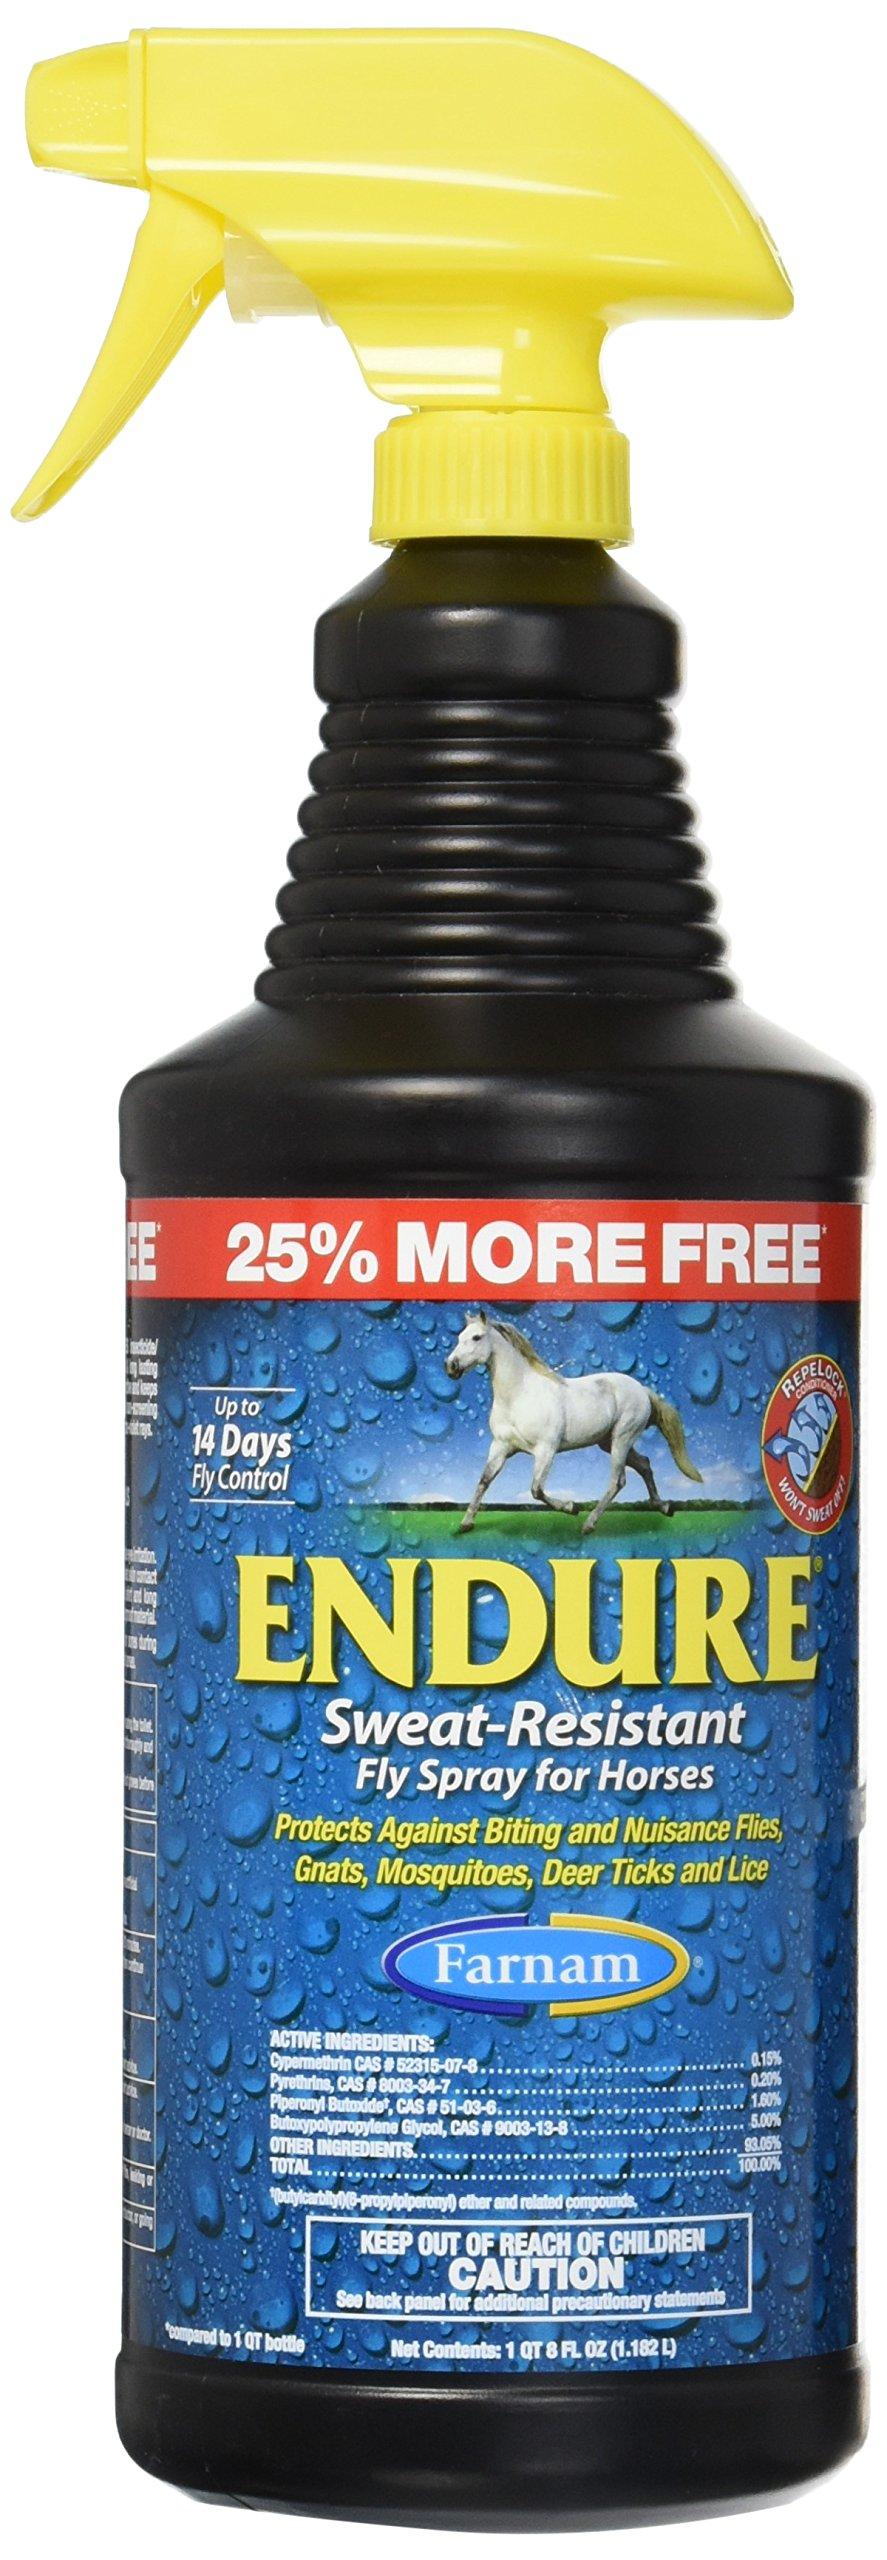 Farnam Companies 100502139 554161 Endure Sweat Resistant Fly Spray for Horses Bonus, 40 oz